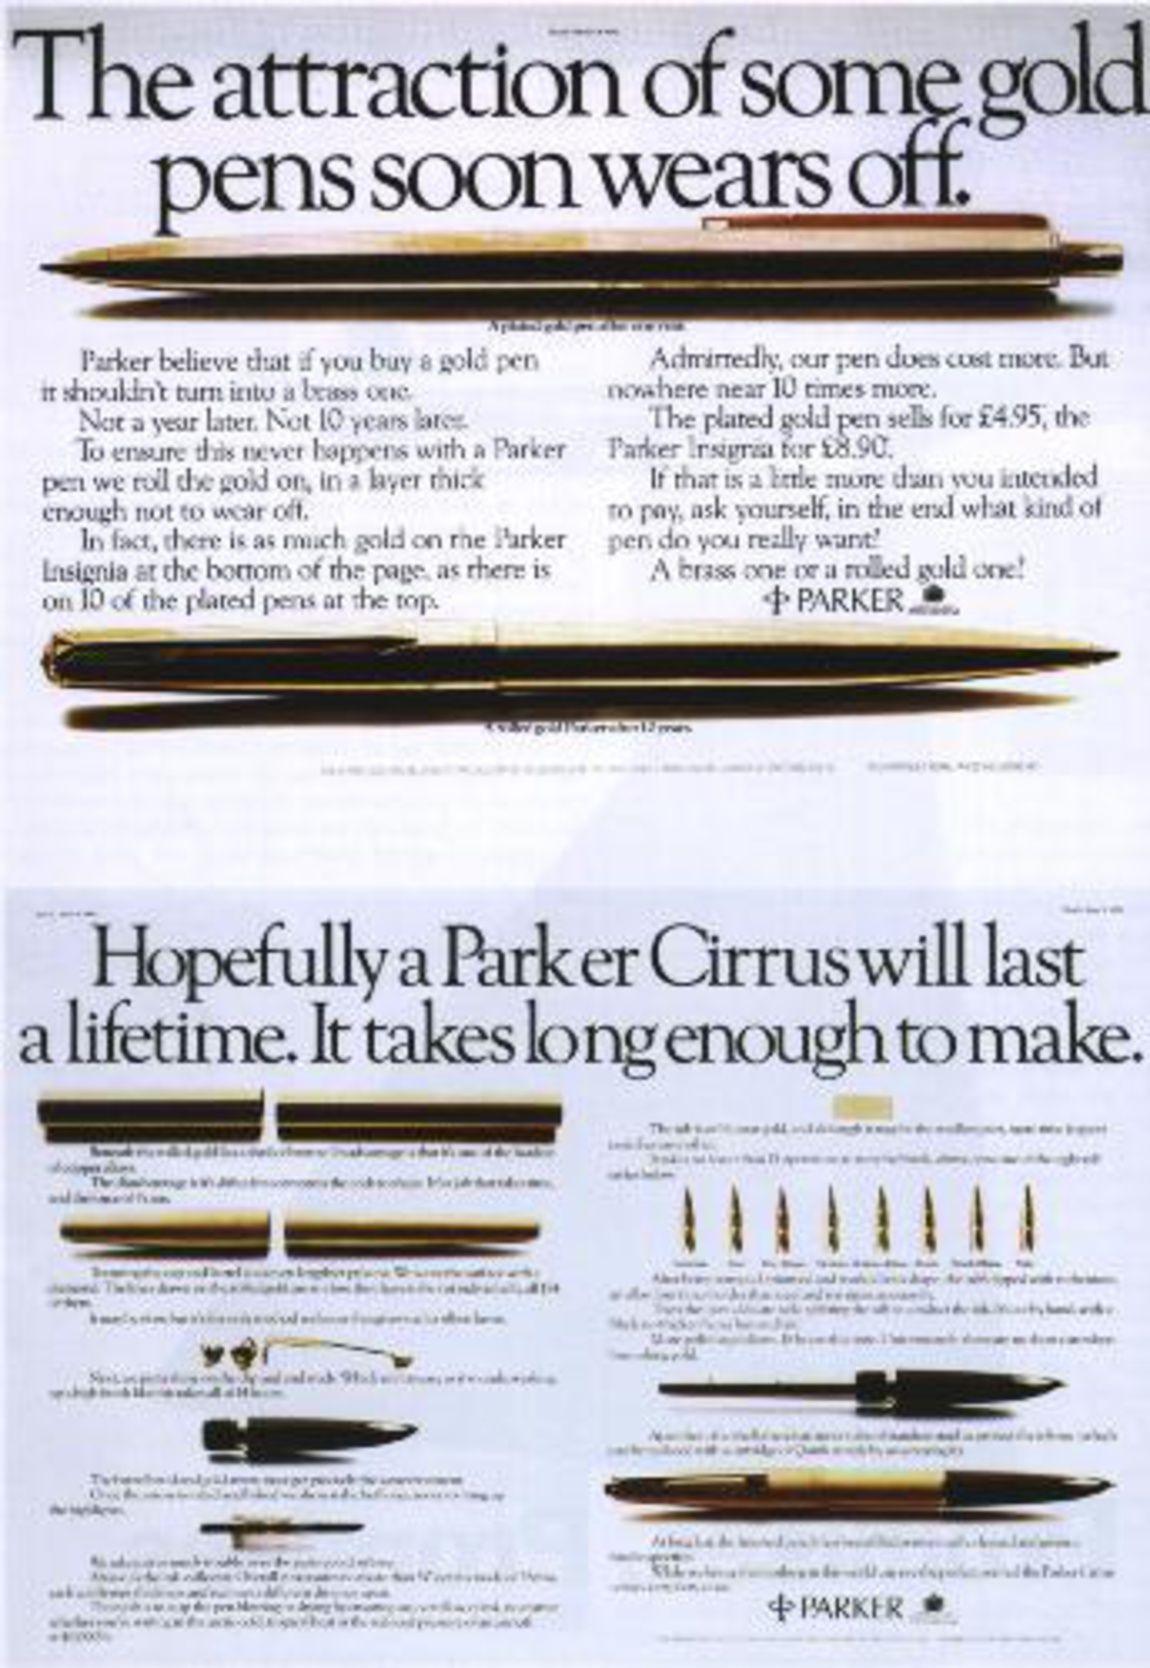 Read more: https://www.luerzersarchive.com/en/magazine/print-detail/parker-26963.html Parker Year: 1977 Tags: Parker,Collett Dickenson Pearce & Partners Ltd, United Kingdom,Tony Brignull,Neil Godfrey